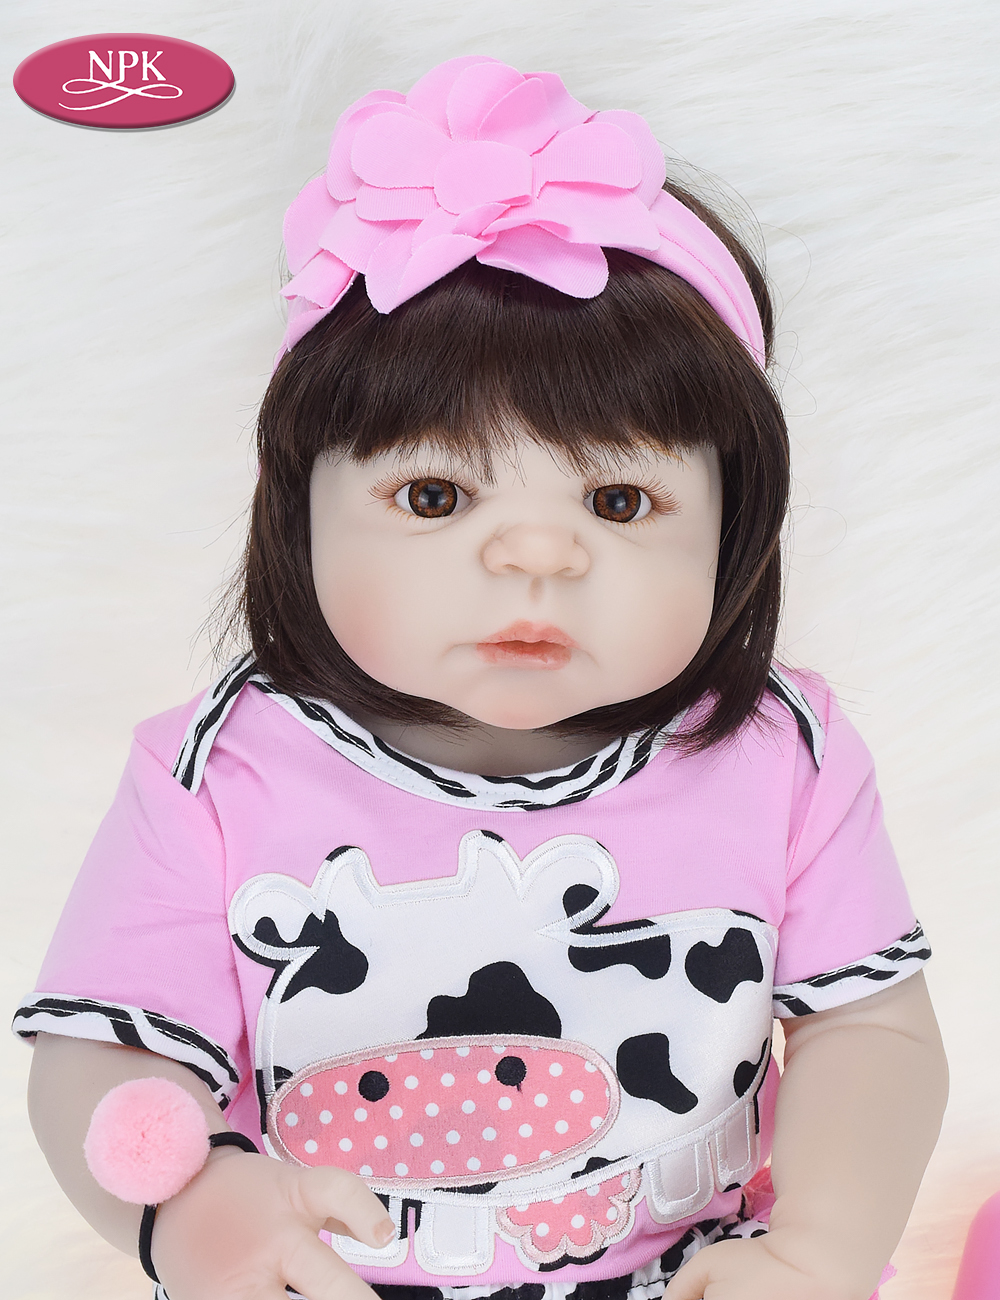 NPK Real 57CM Full Body SIlicone Girl Reborn Babies Doll Bath Toy Lifelike Newborn Princess Baby Doll Bonecas Bebe Reborn Menina (9)